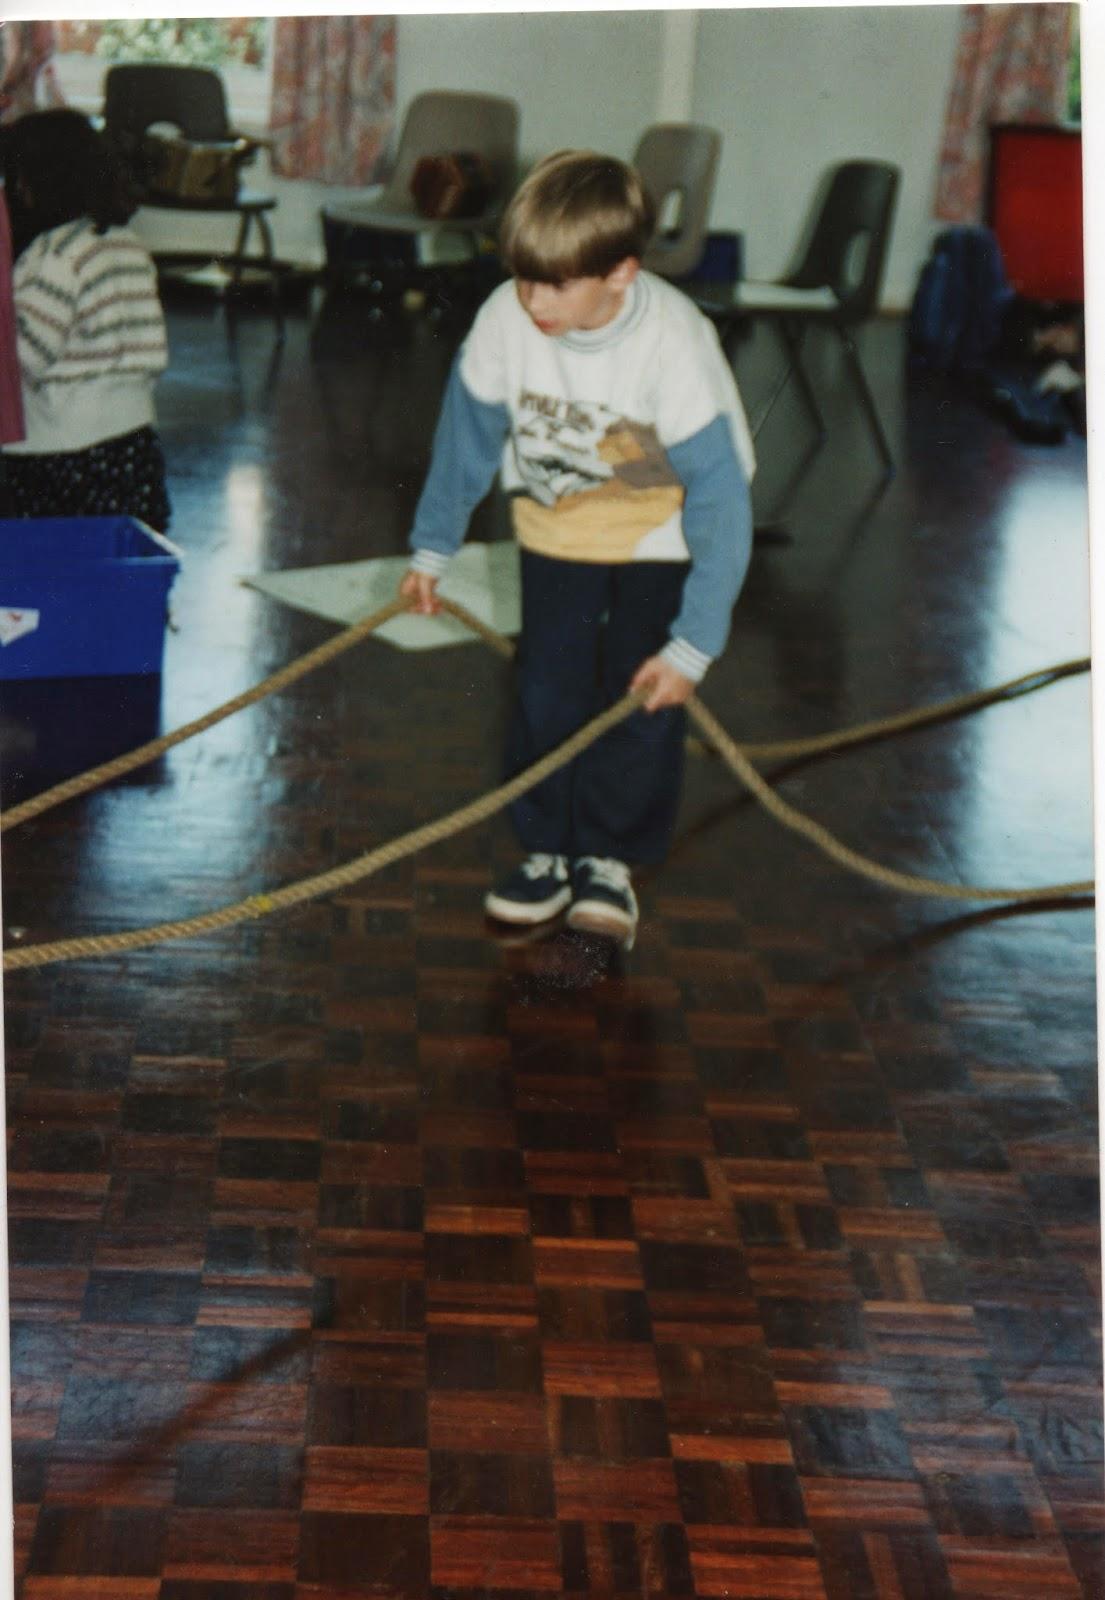 SS Southcoaster rehearsal Starcross School Wren Trust 1990s